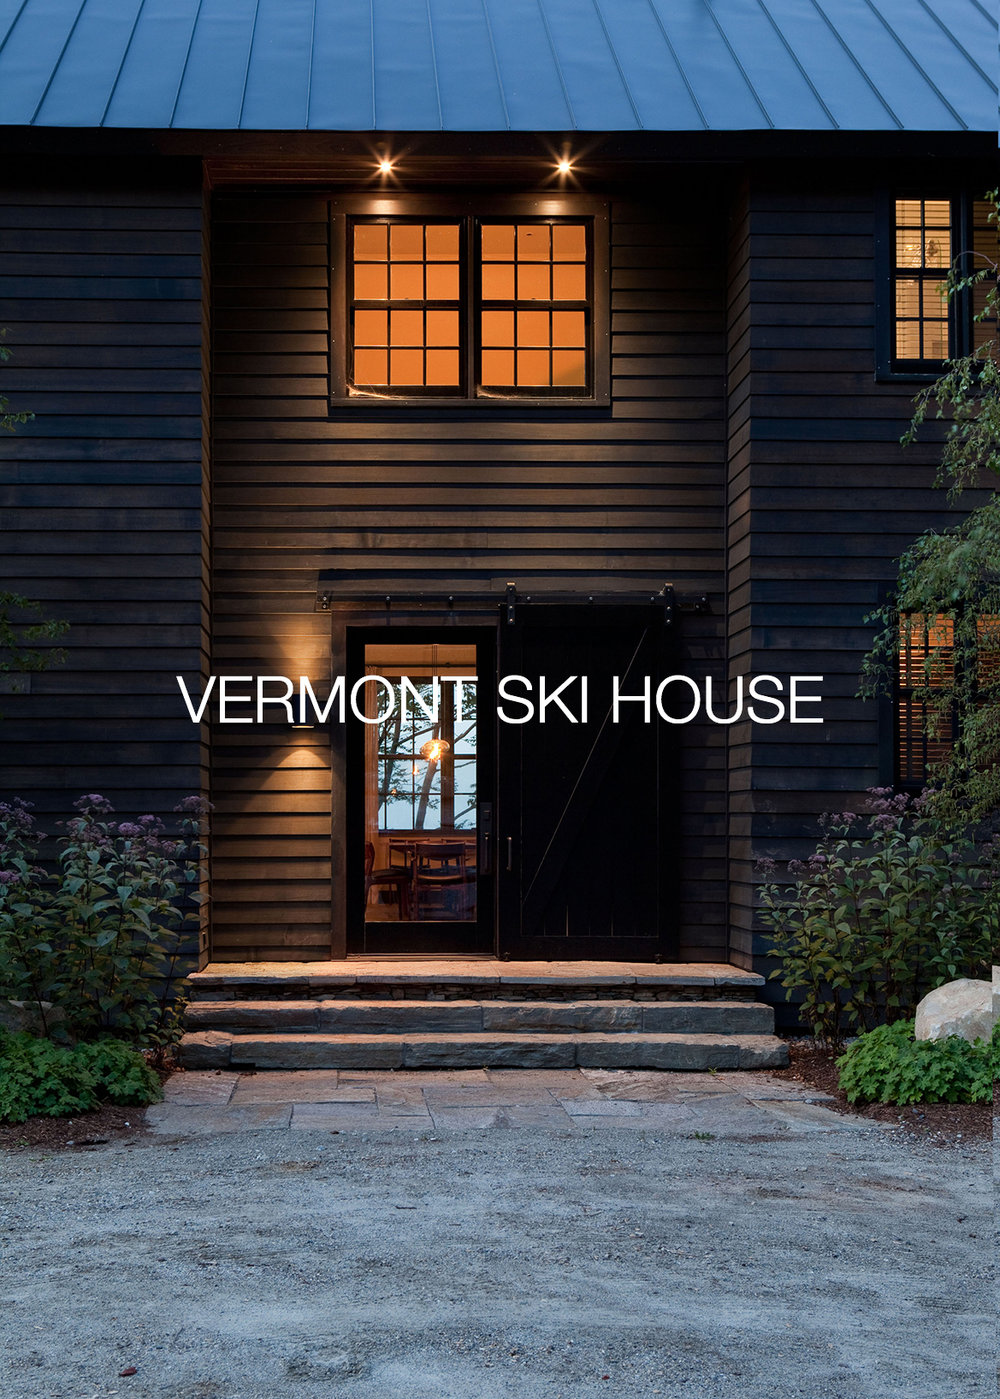 Vermont Ski House.jpg